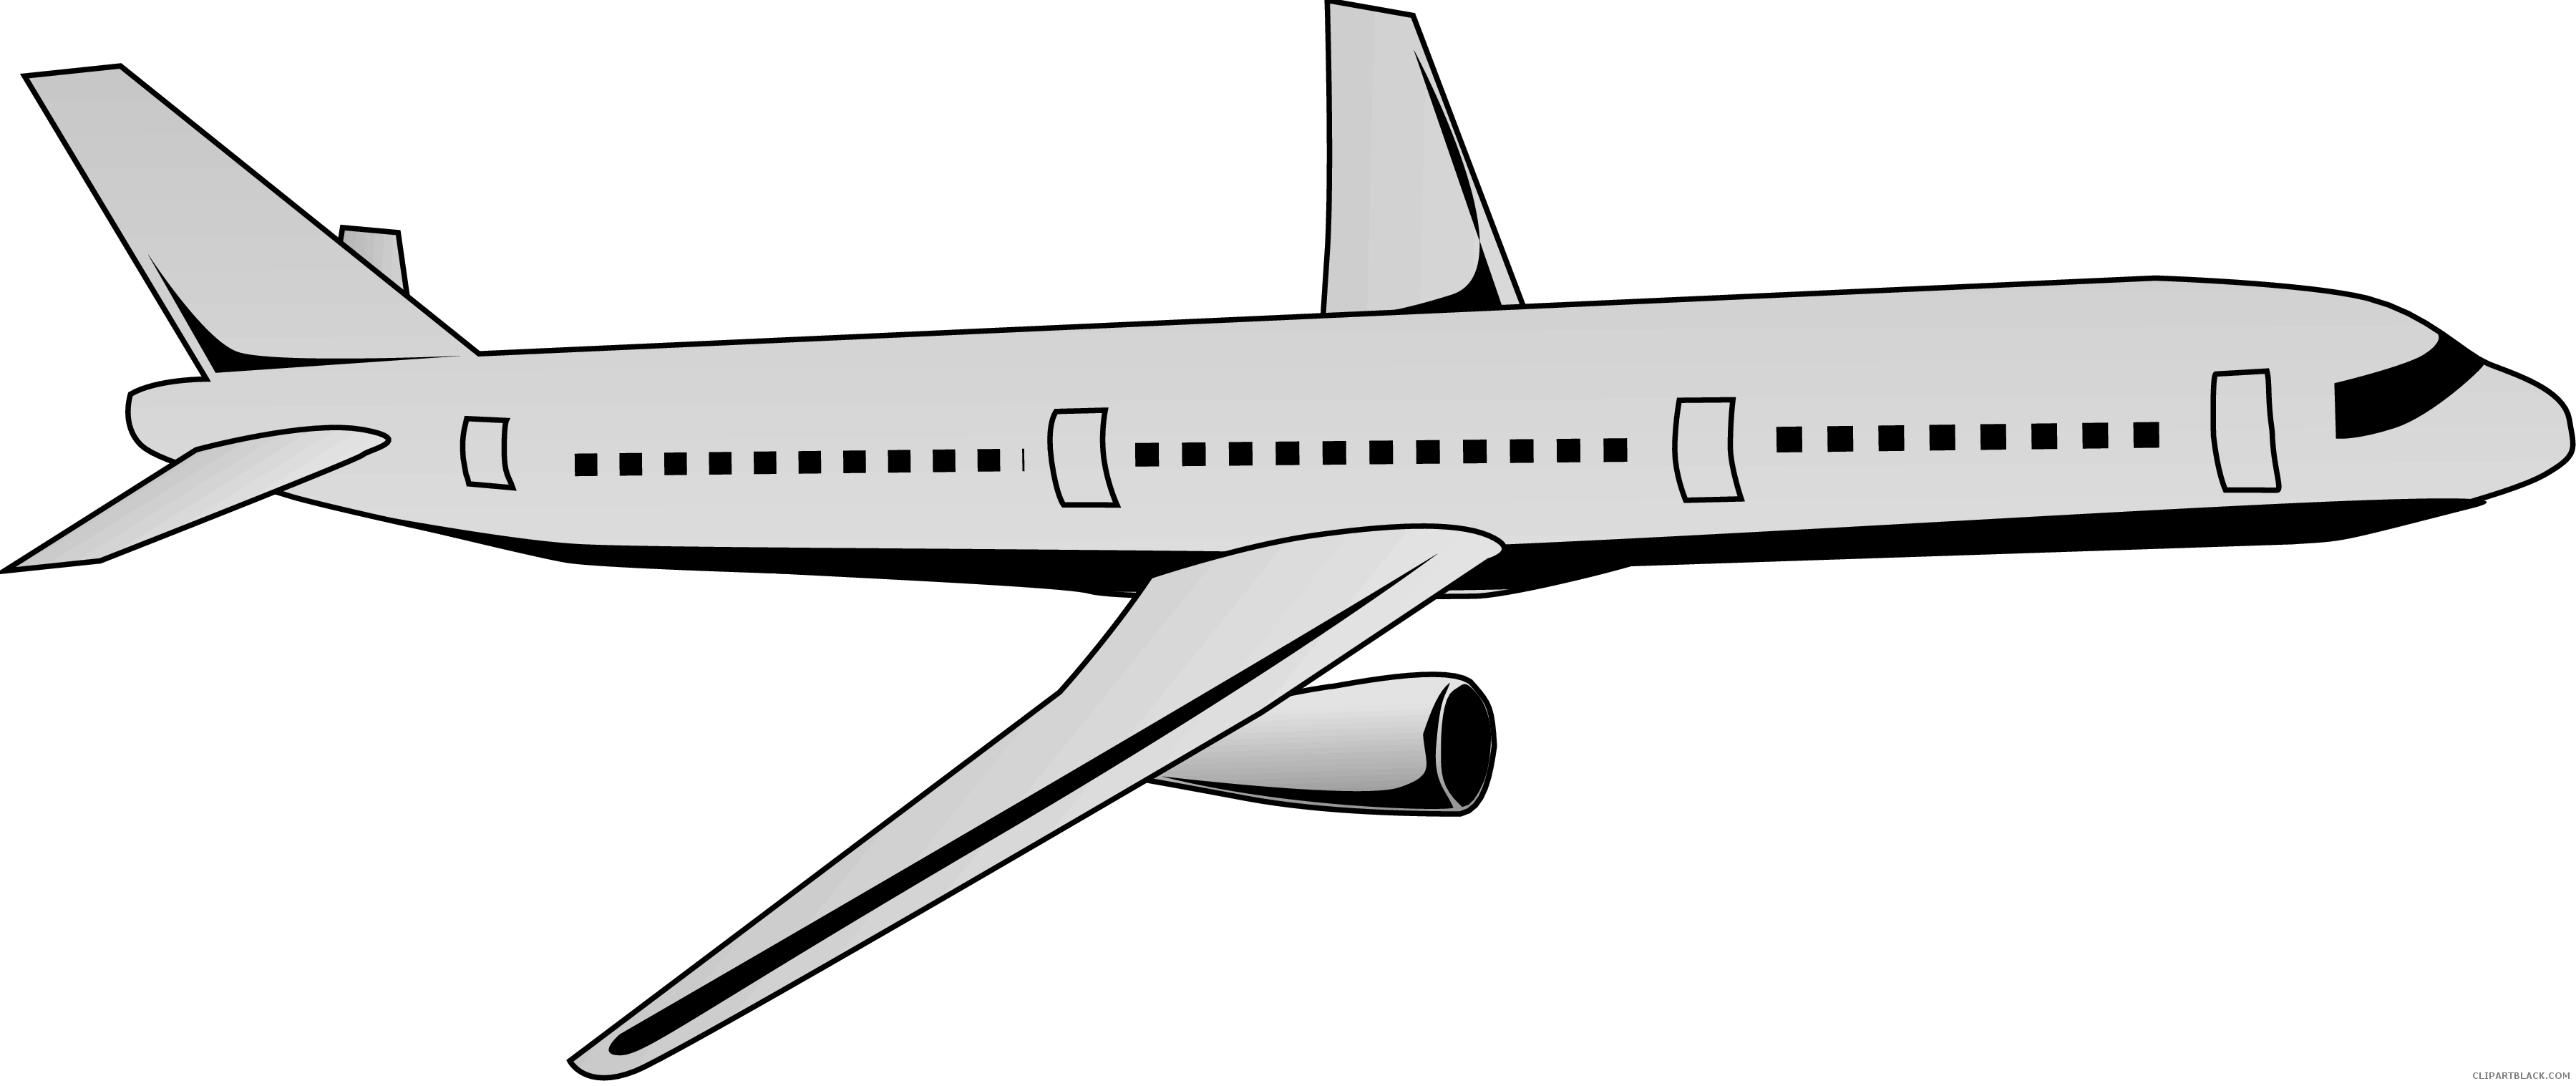 cartoon airplane cartoon airplane png clipart best cartoon airplane